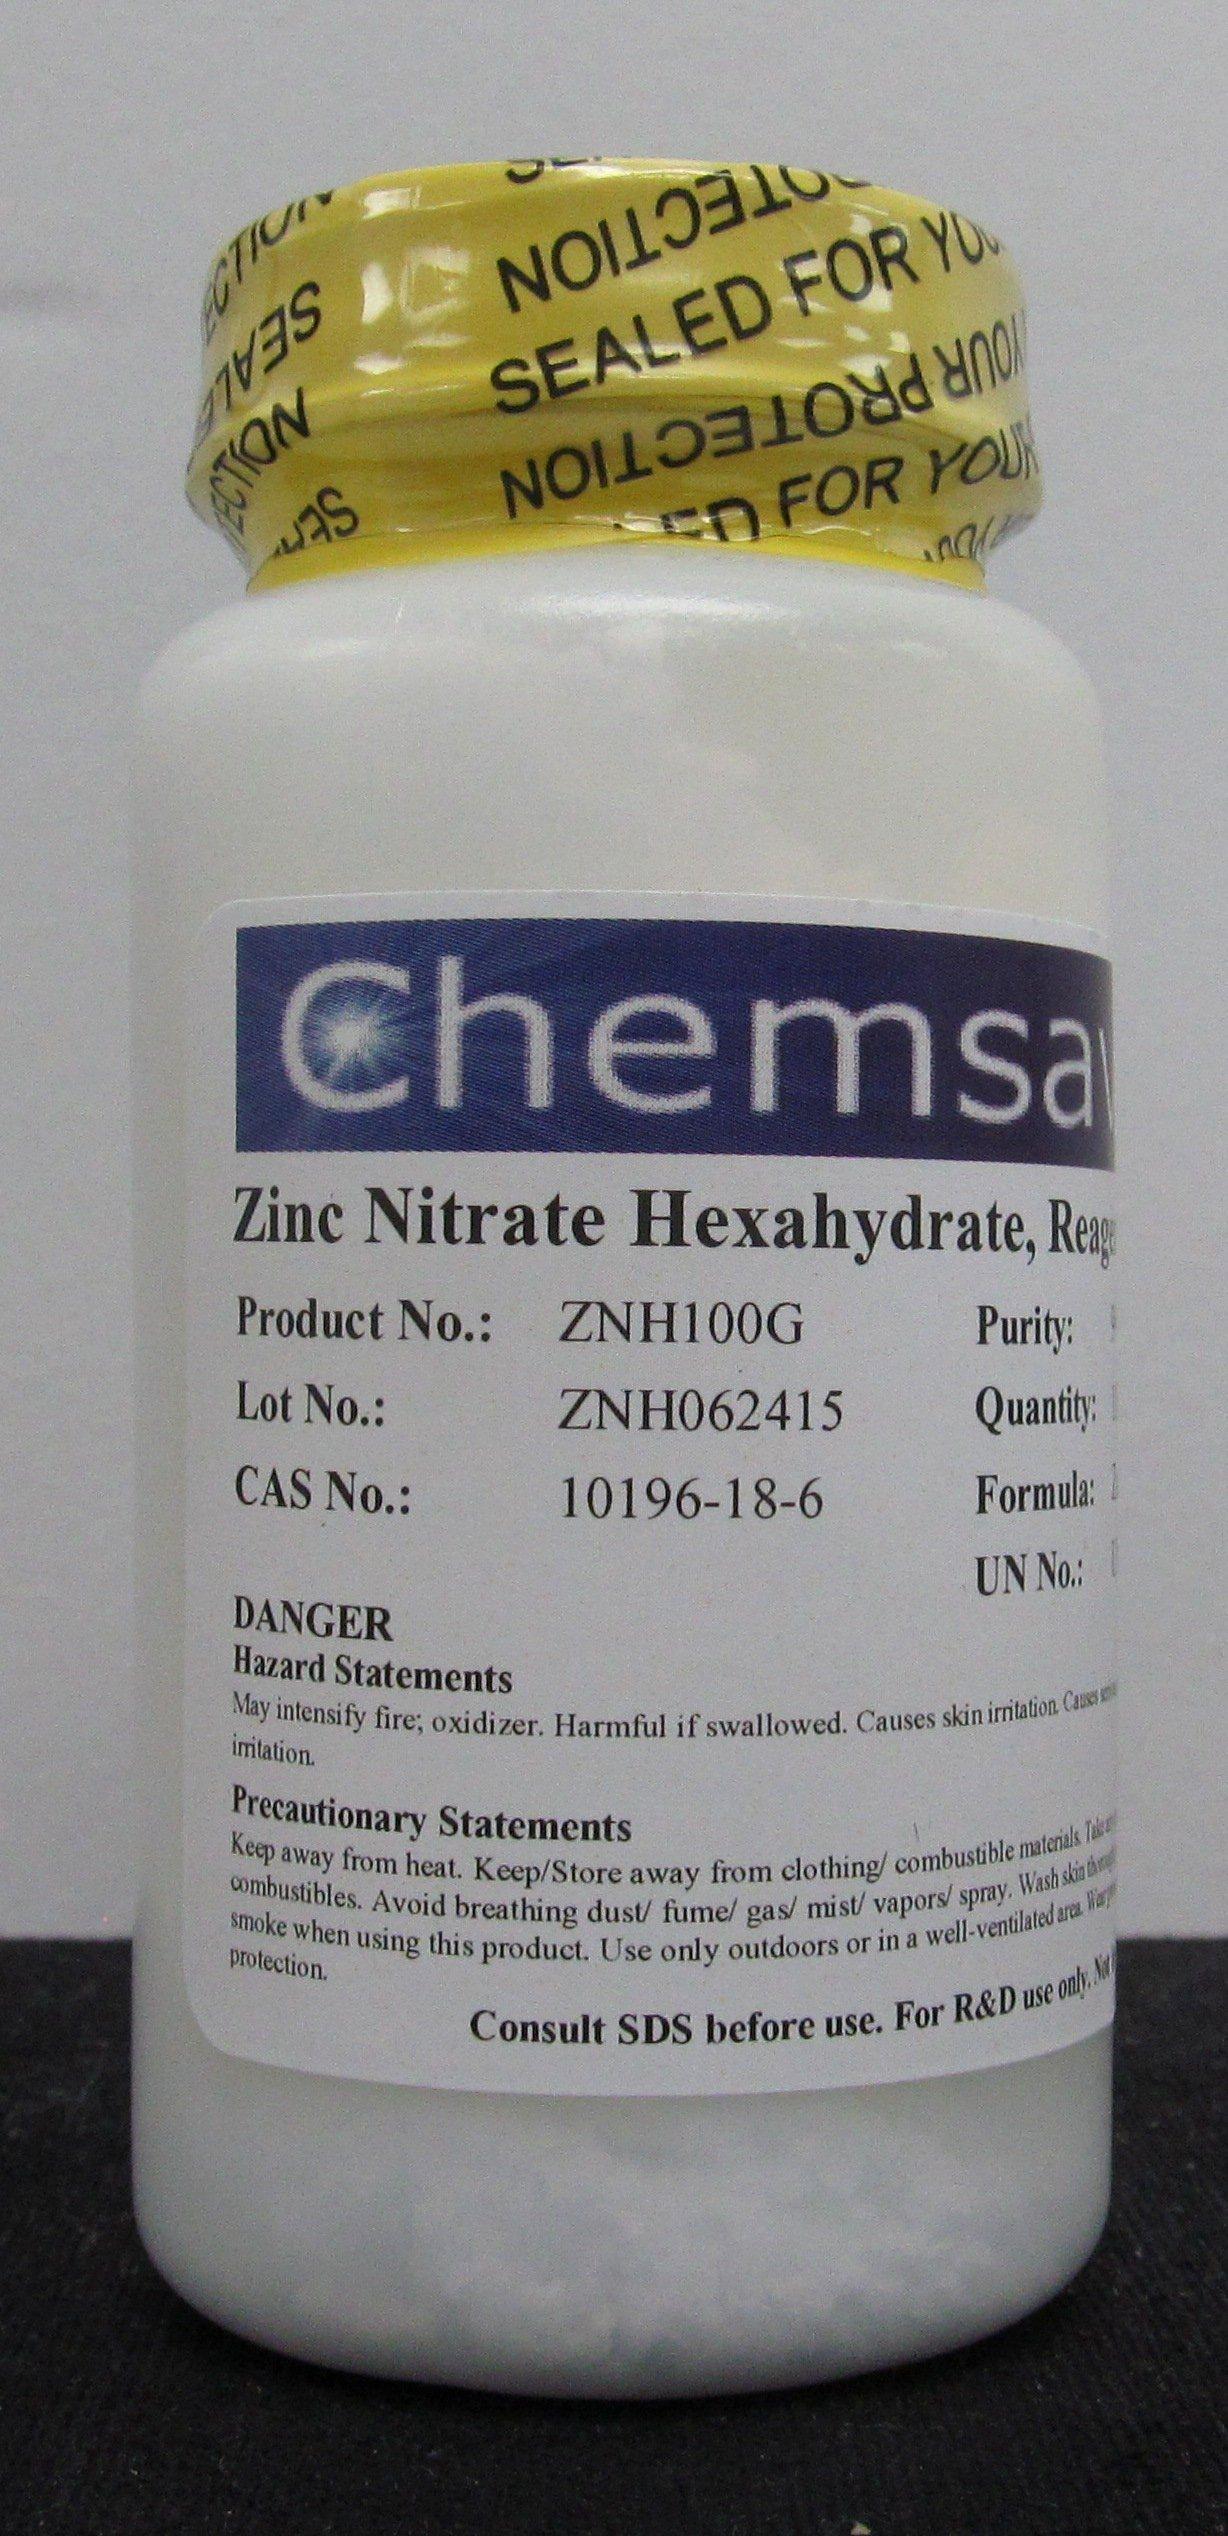 Zinc Nitrate Hexahydrate, Reagent, 99+%, 100g